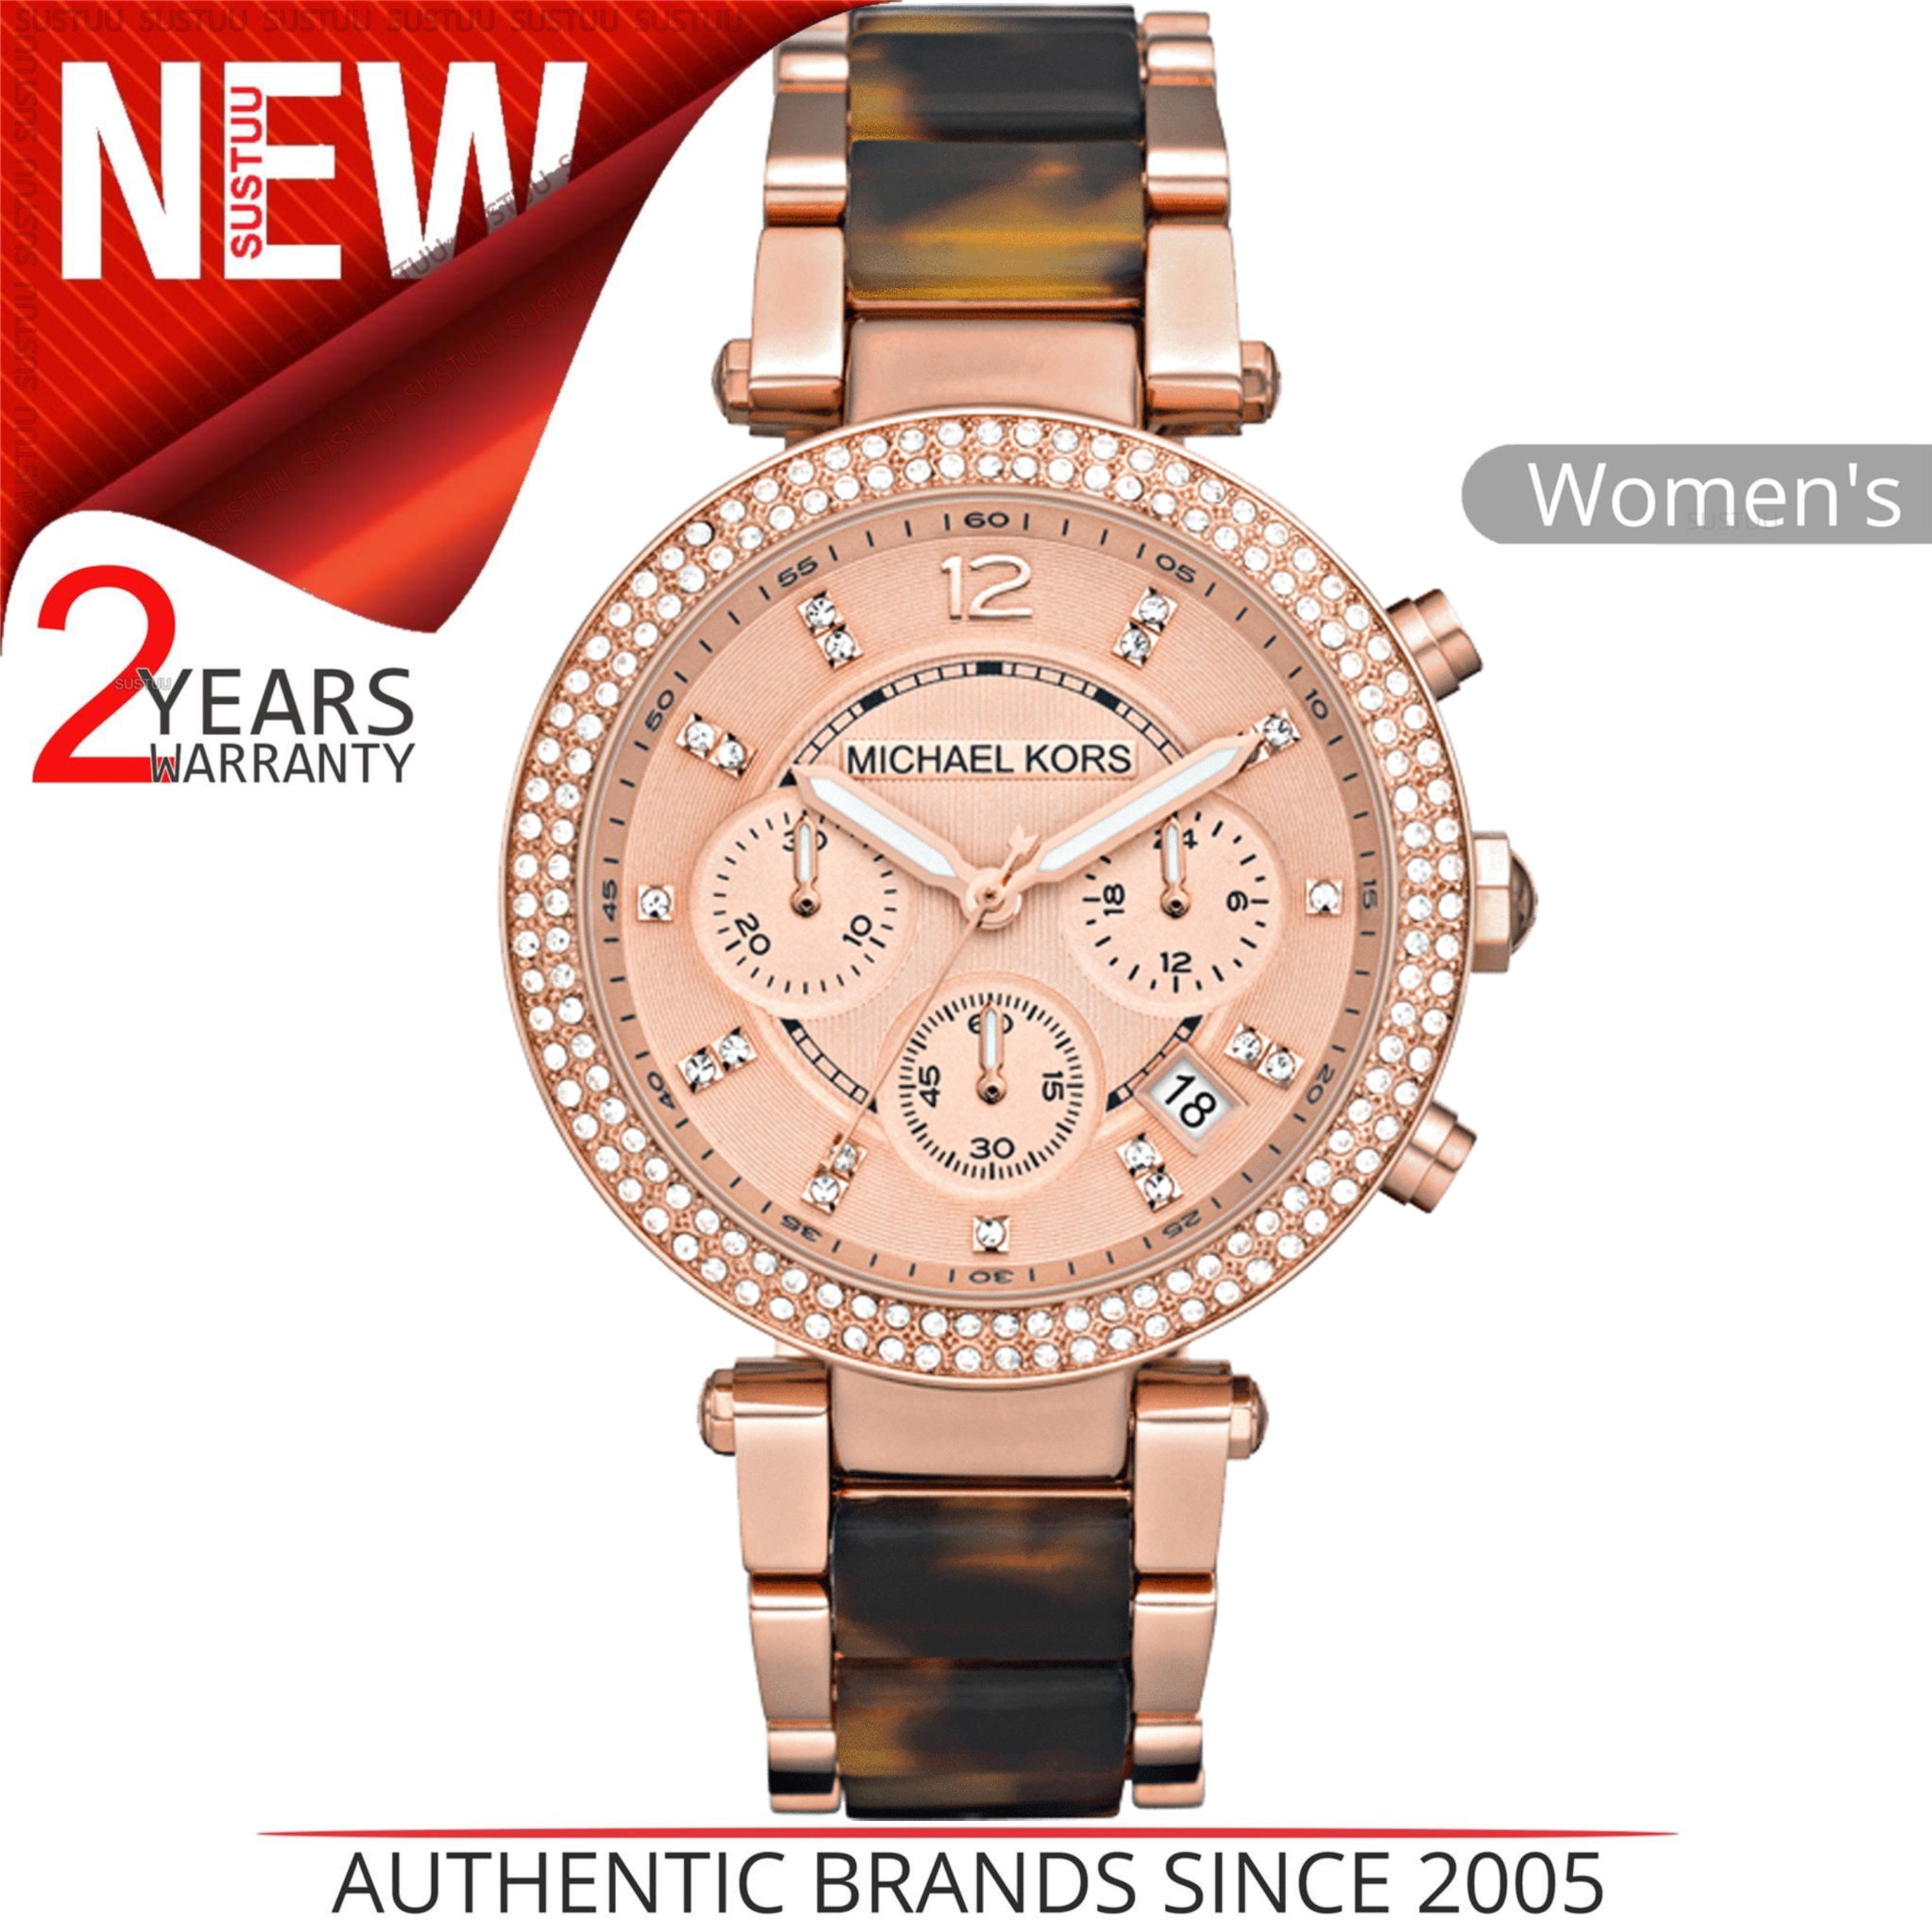 d459d0e6630a Details about Michael Kors Ladies  Parker Brown Tortoiseshell Rose Dial  Designer Watch MK5538